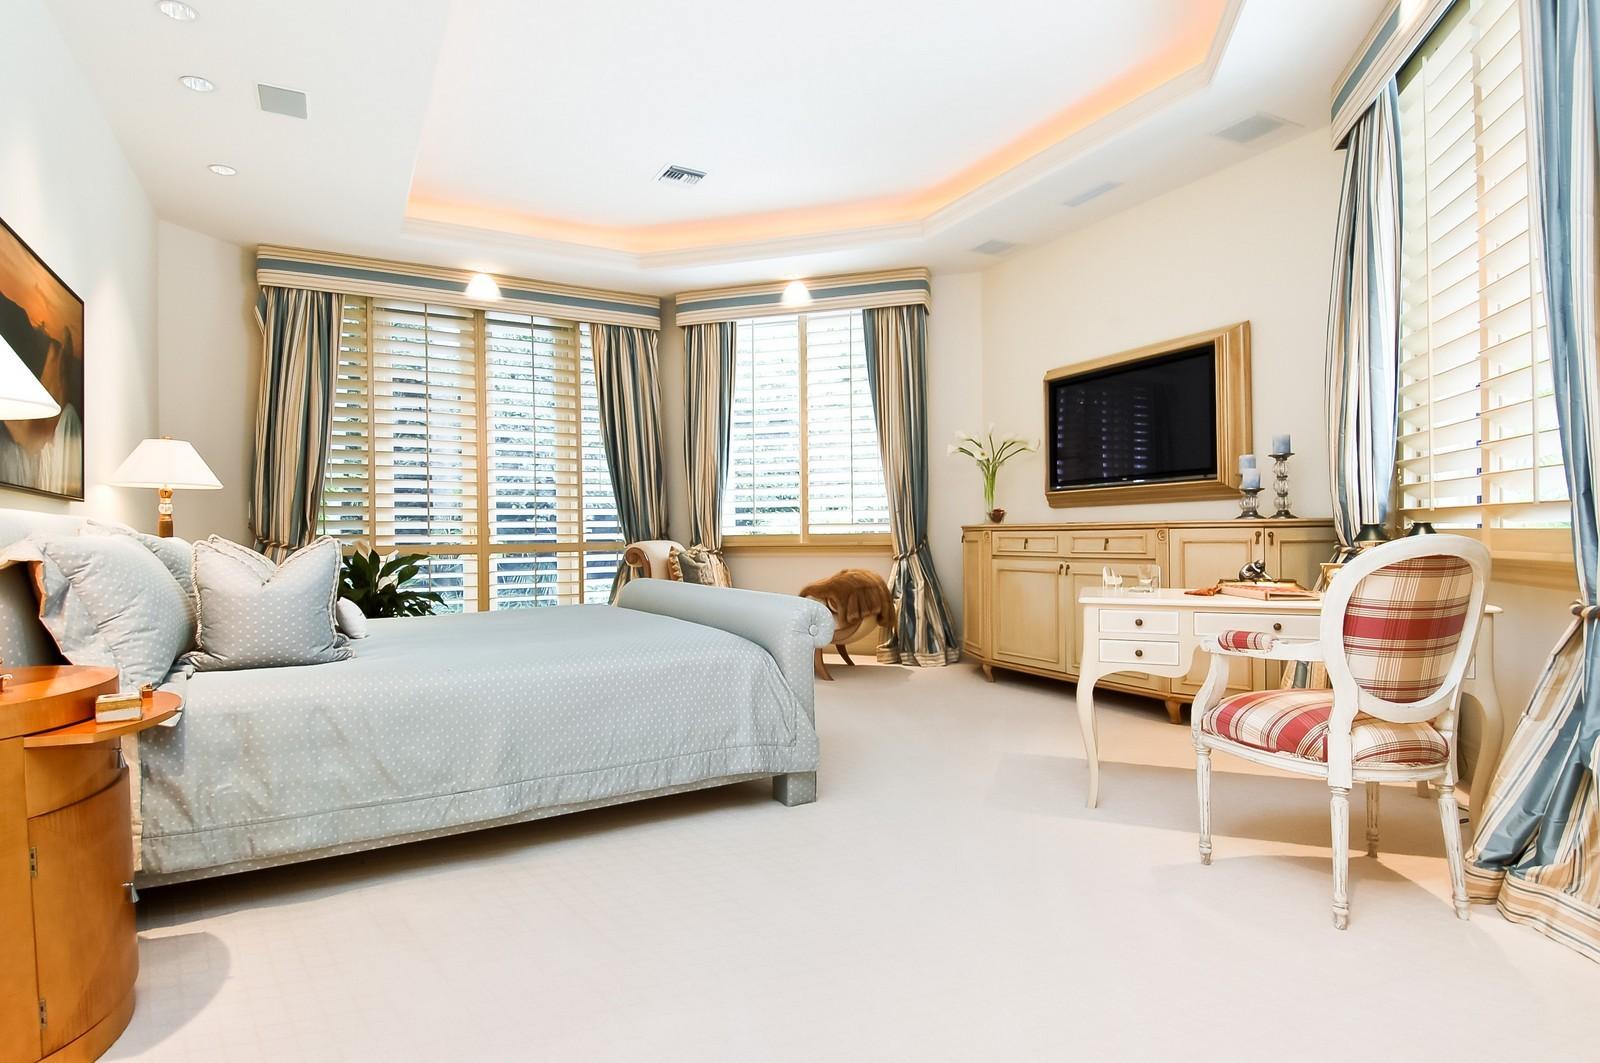 Real Estate Photography - 19674 OakbrookCourt, Boca Raton, FL, 33434 - Master Bedroom